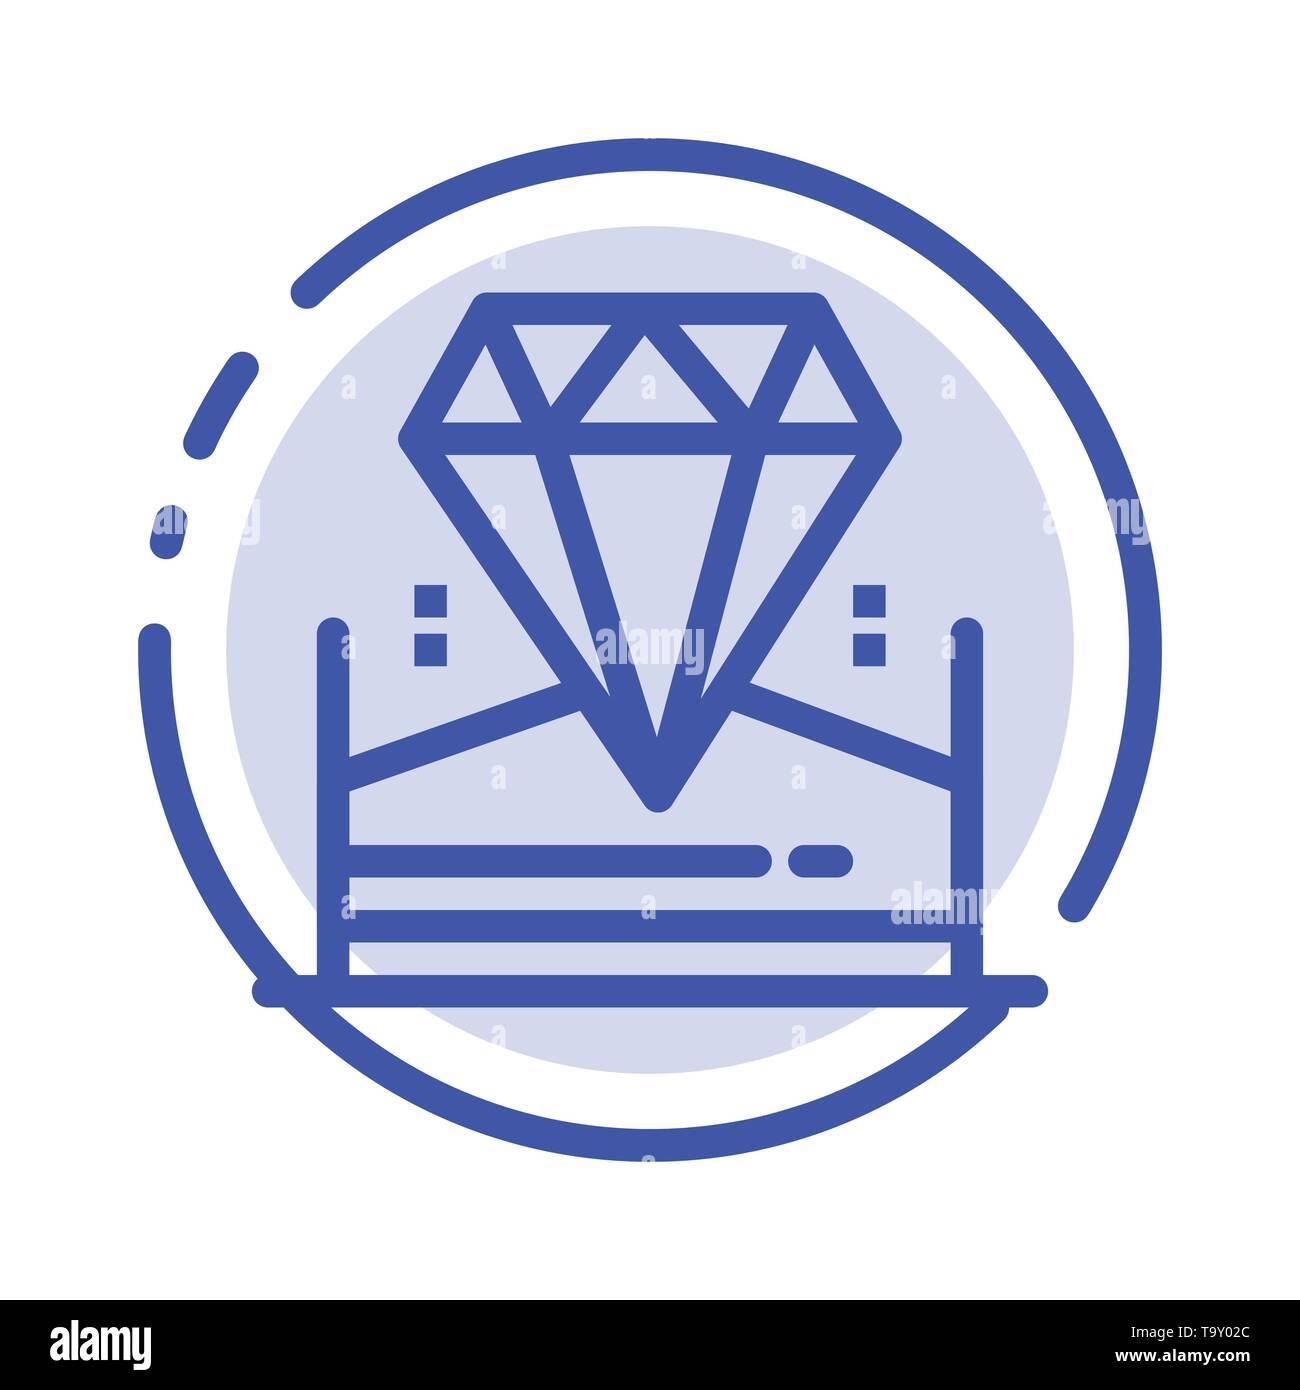 Brilliant, Diamond, Jewel, Hotel Blue Dotted Line Line Icon - Stock Image